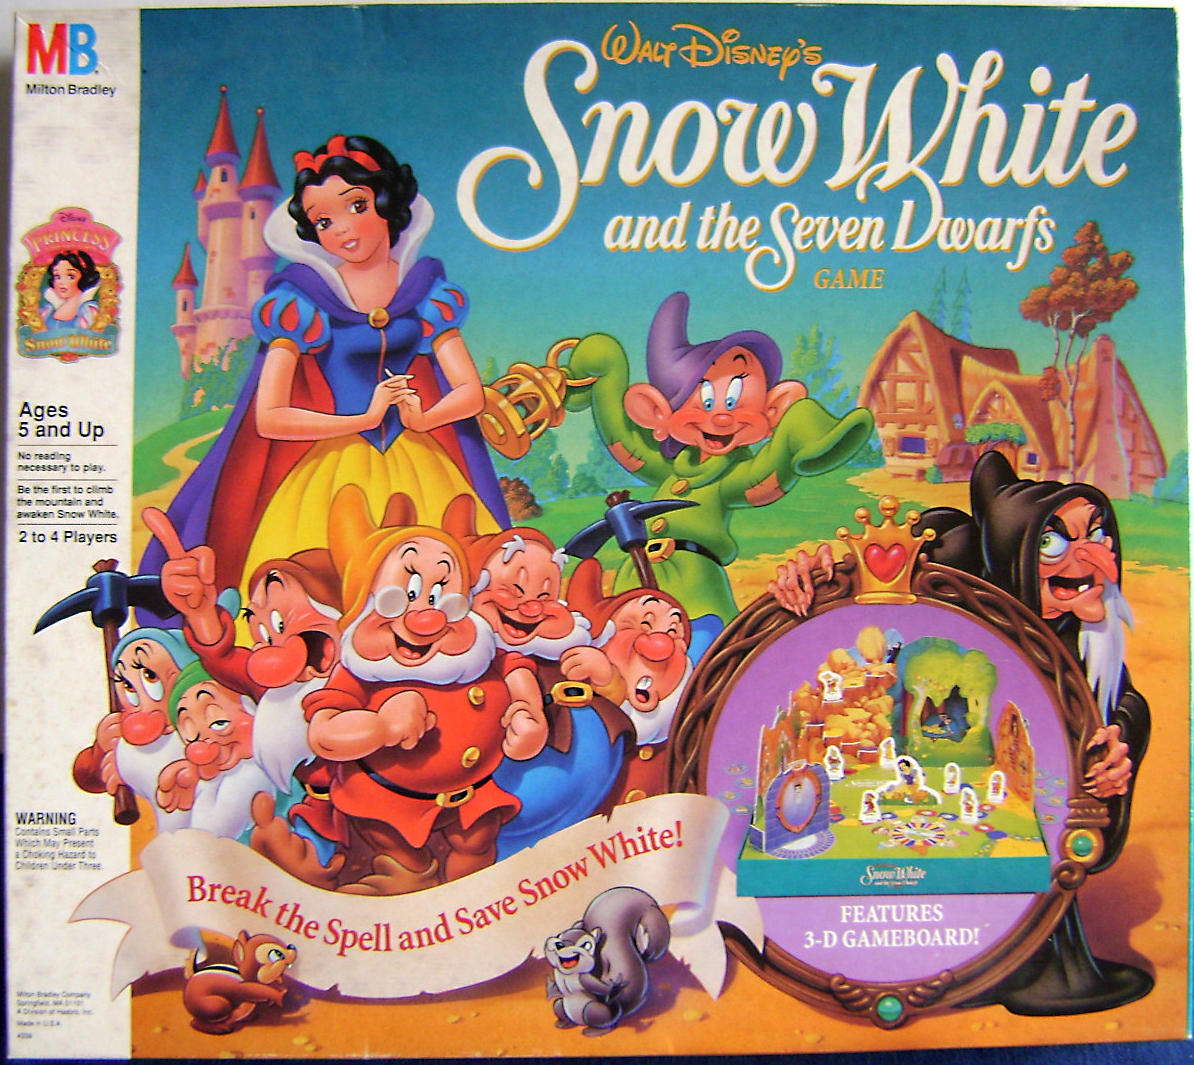 Snow White & the Seven Dwarfs: A Gemstone Mining Game ...